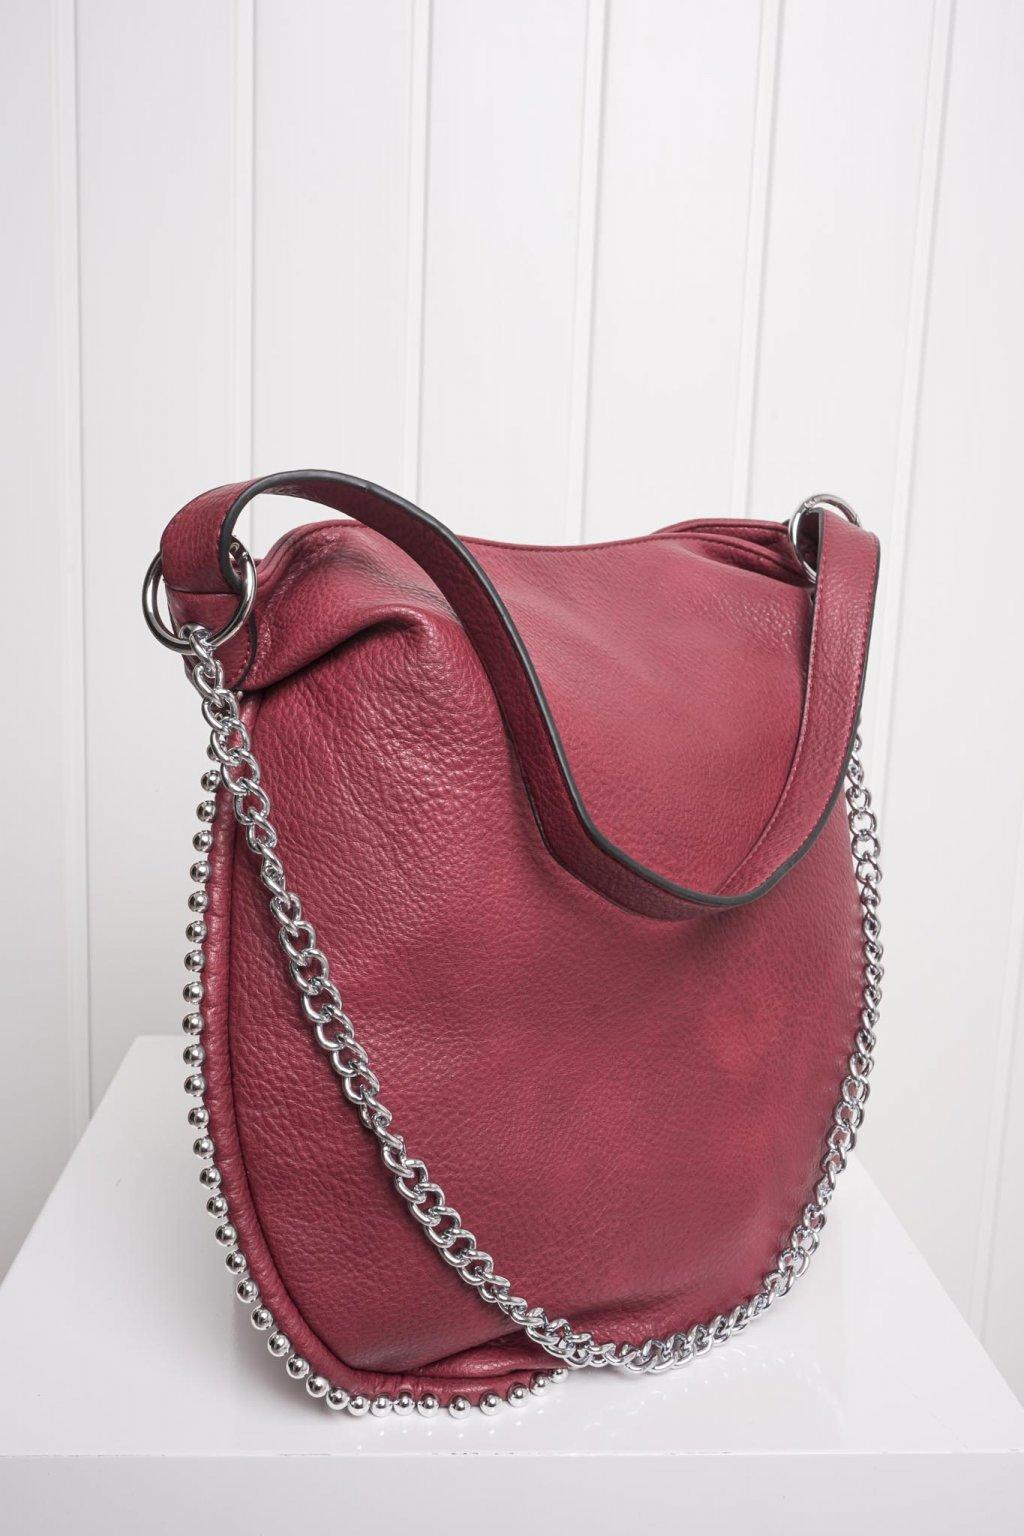 Kabelka, ruksak, dobrá cena, čierna kabelka, čierny ruksak, basic, kabelky, ruksaky 079